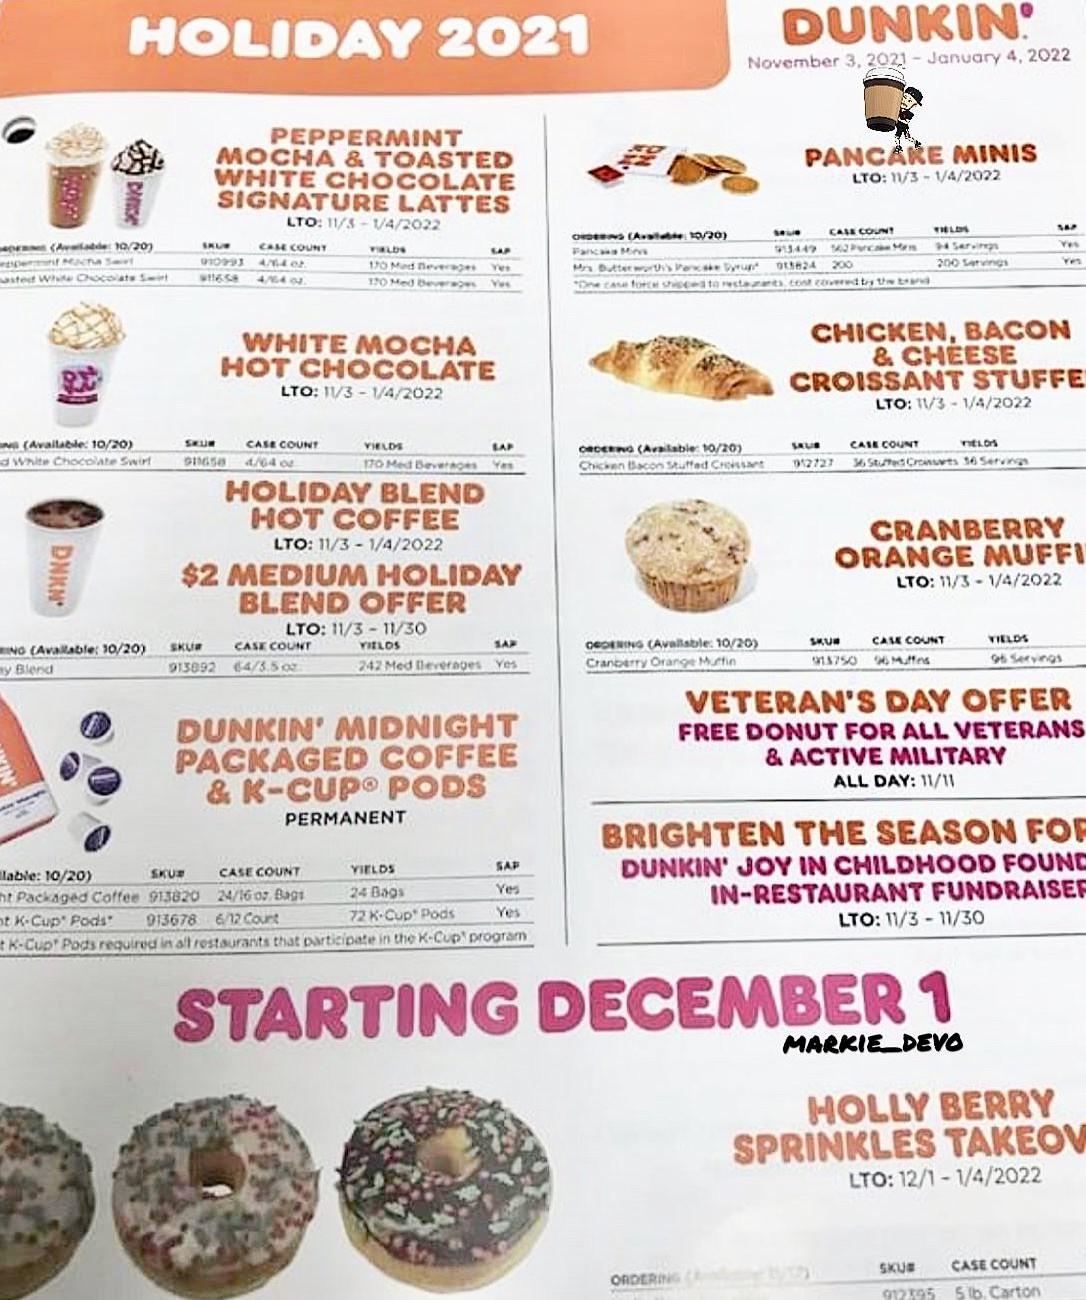 Dunkin Holiday Menu 2021